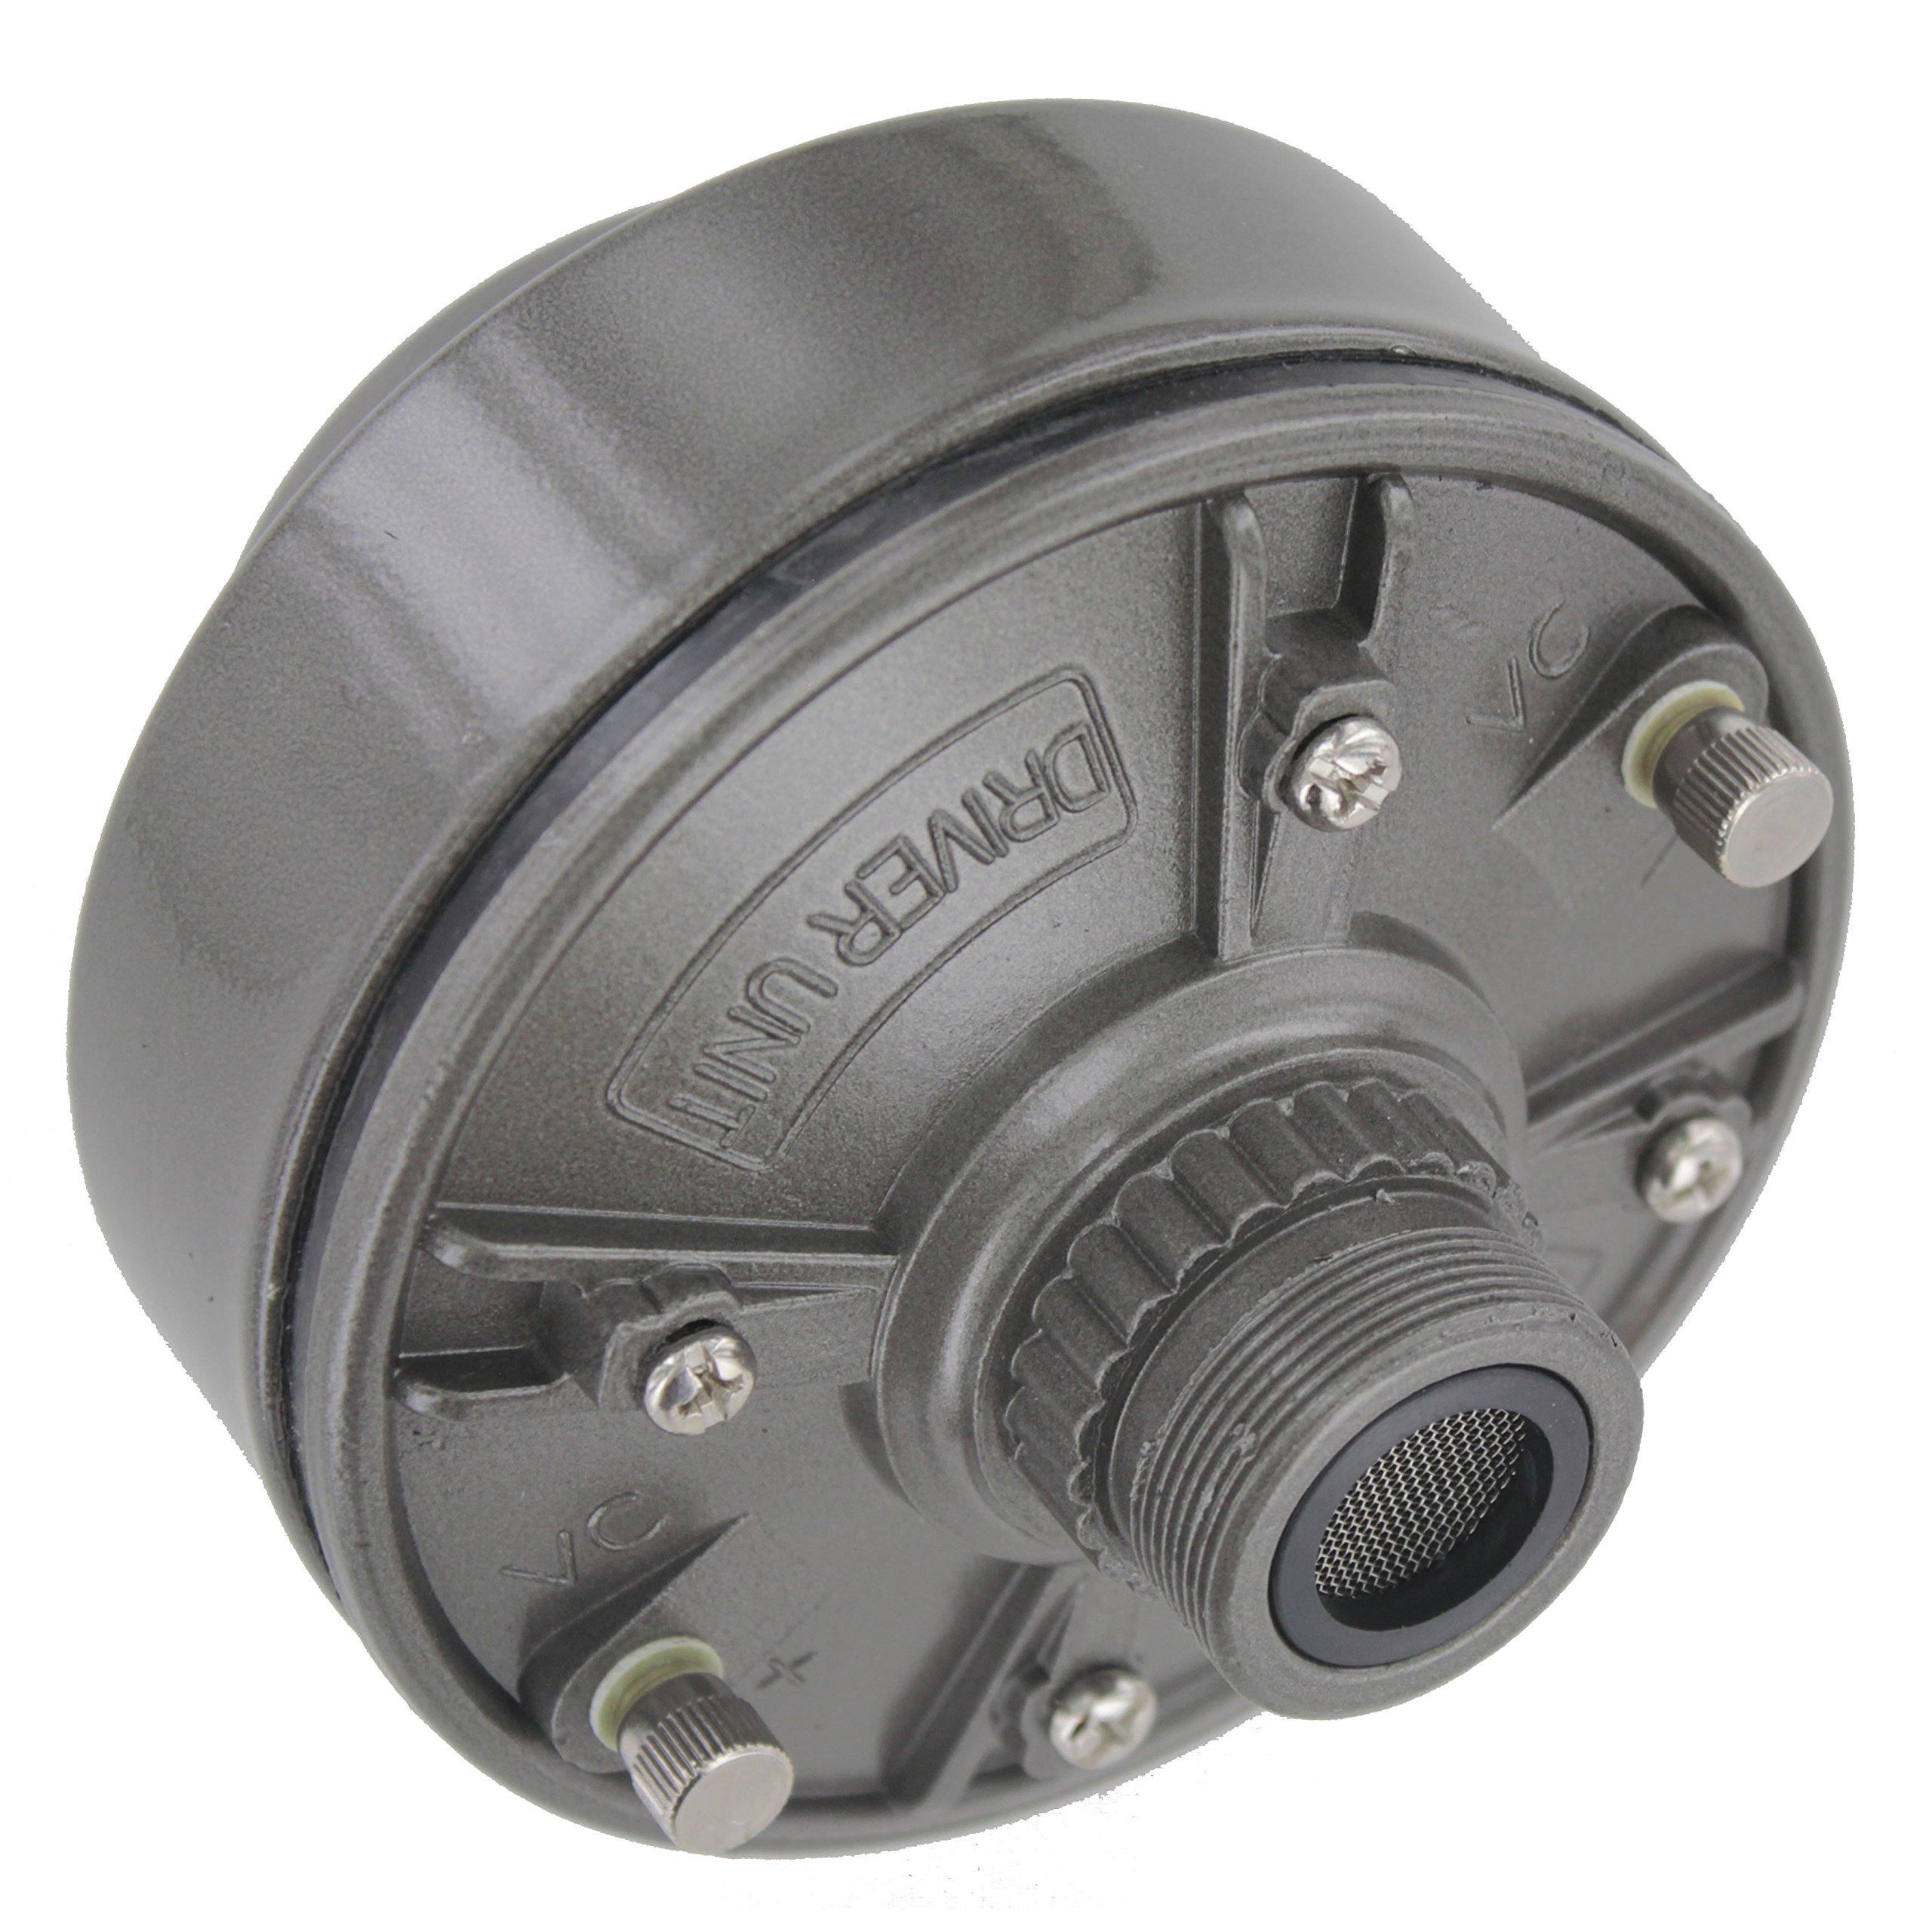 MIYAKO 100 Watts 16 ohms Speaker Driver Unit with Aluminum Body and Neodymium Diaphragm Screw on Type (DU-100)